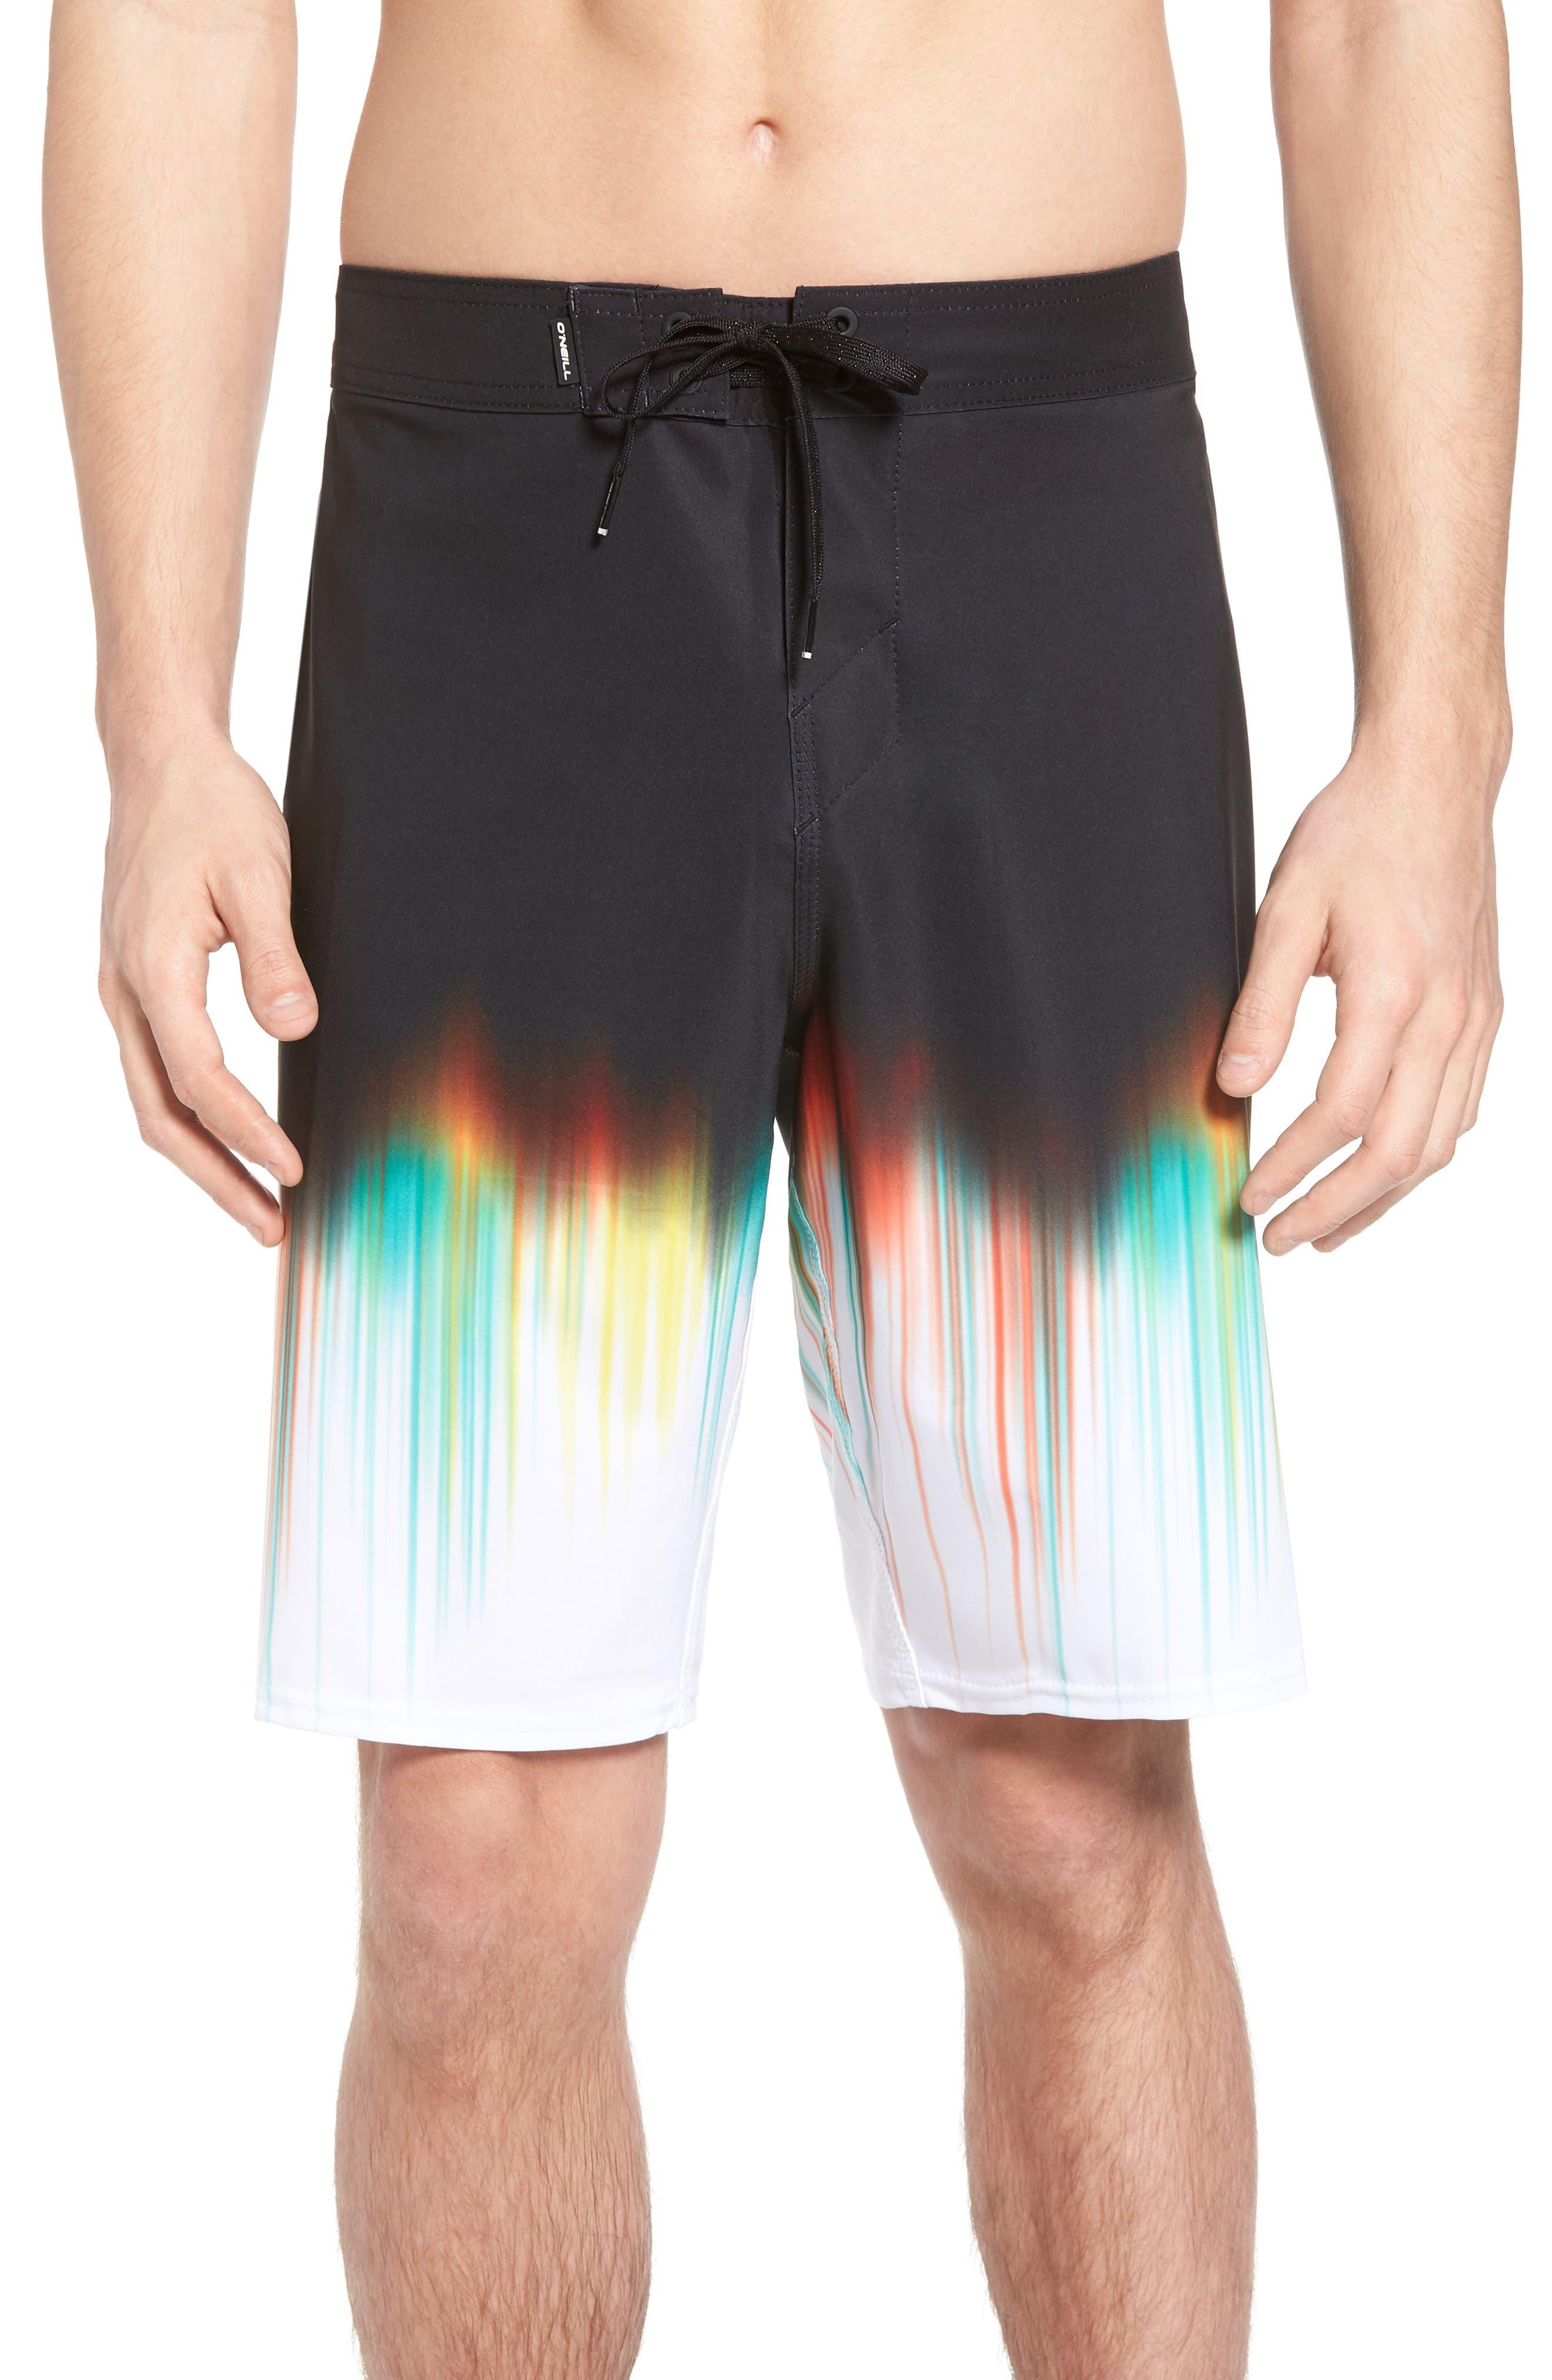 O'Neill Hyperfreak Drippin' Board Shorts